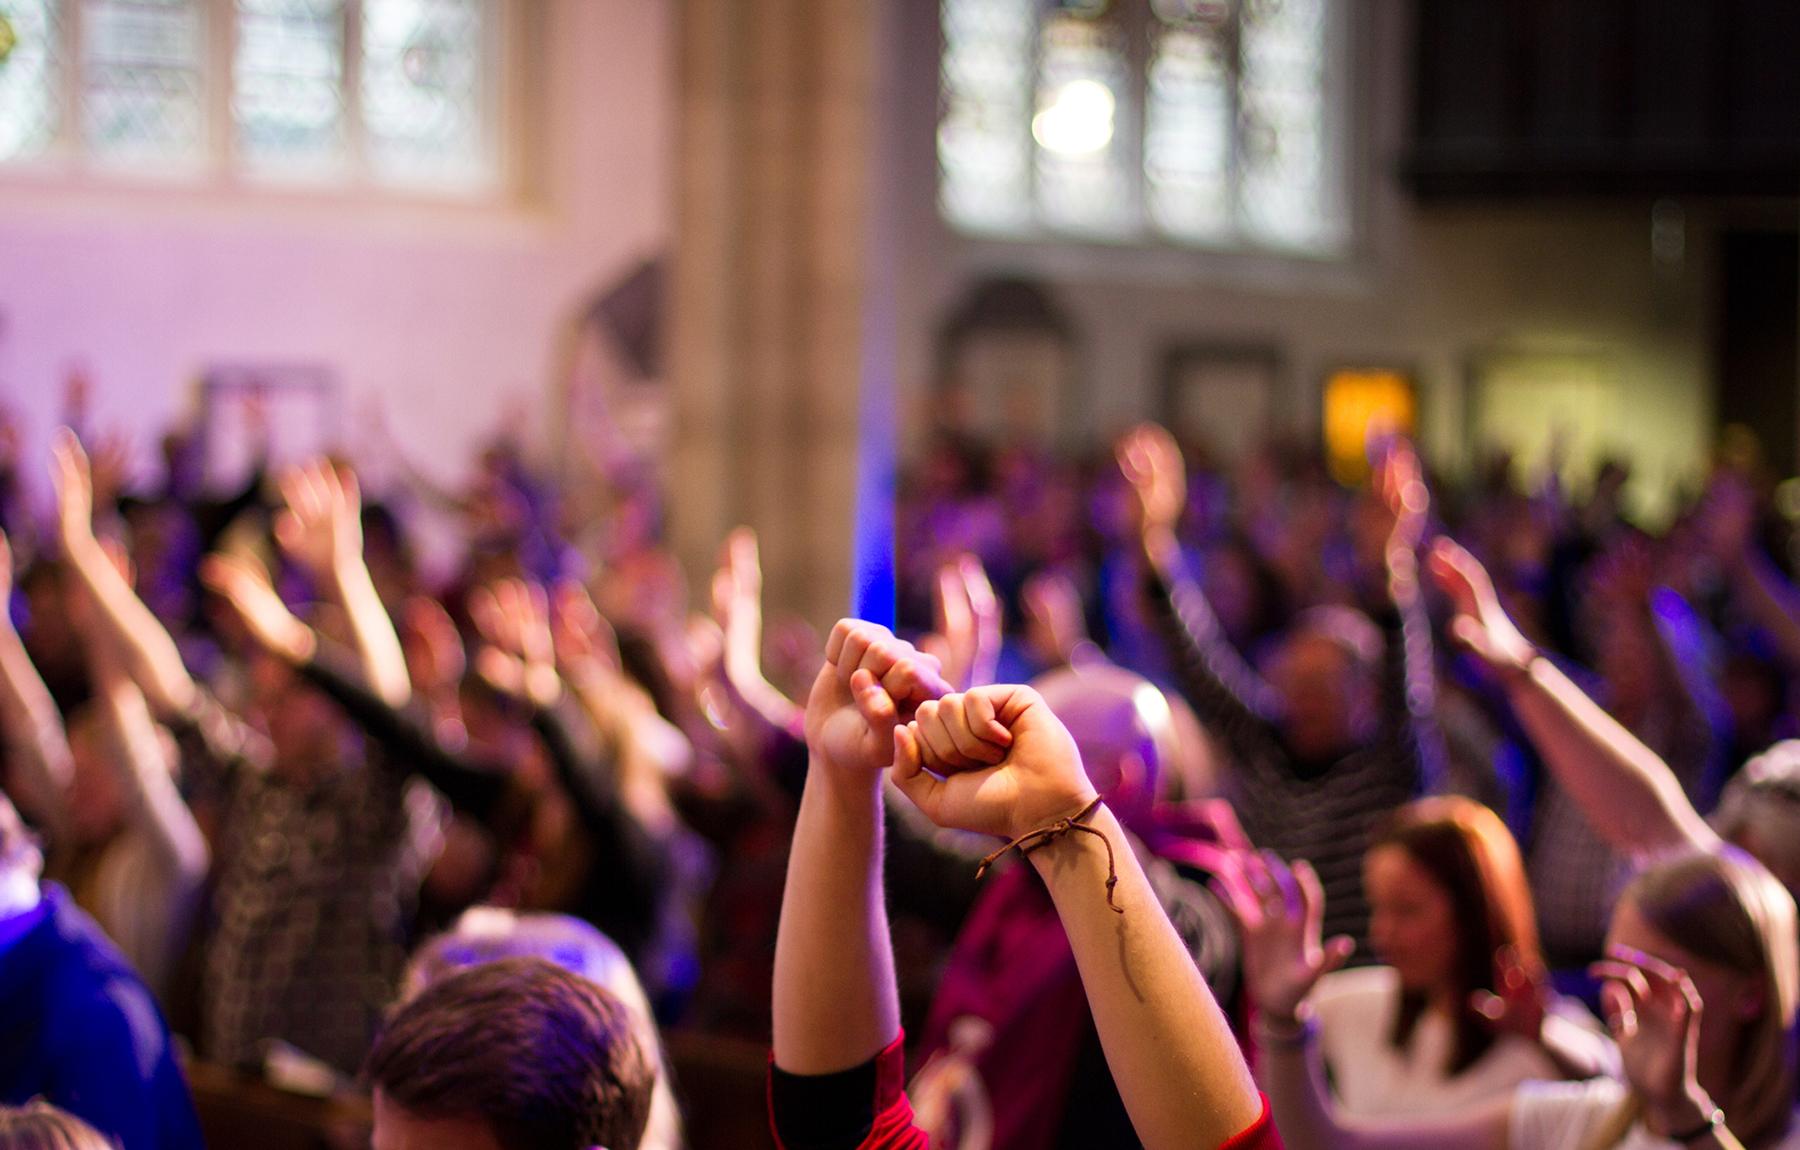 Turn Up the Volume On Engaging Through Worship